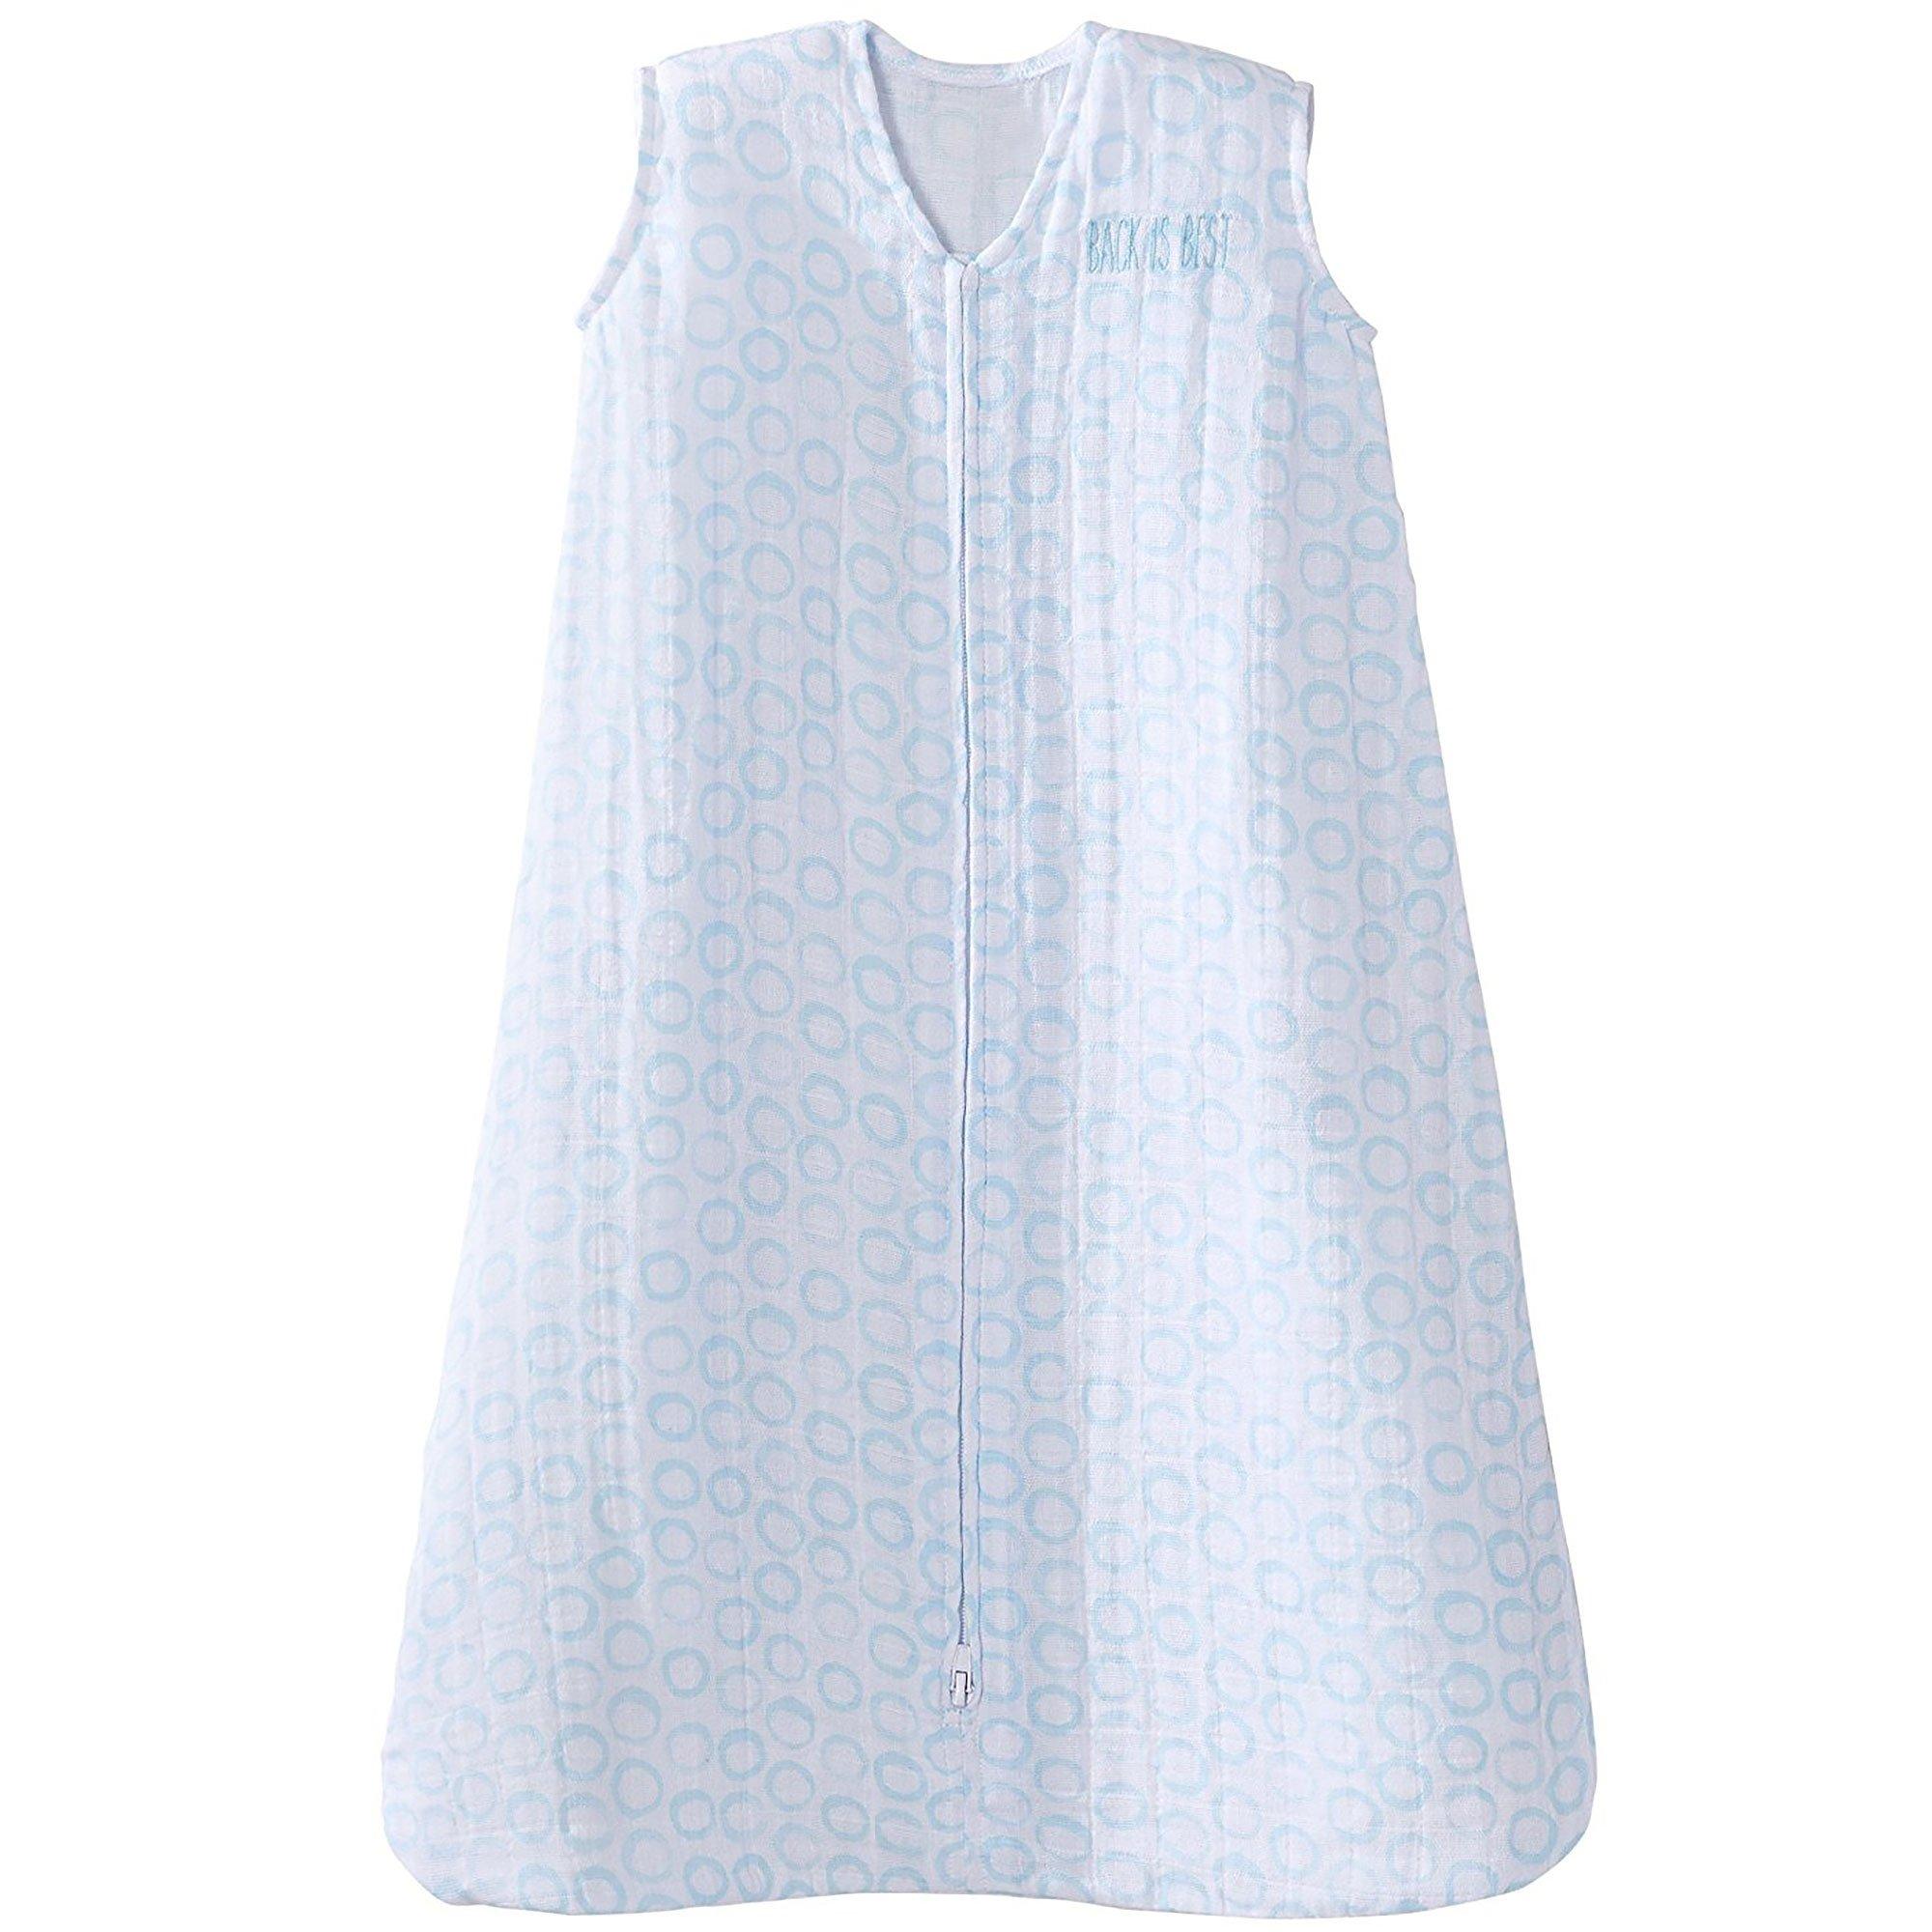 Halo 100% Cotton Muslin SleepSack Wearable Blanket, Circles Turquoise, X-Large